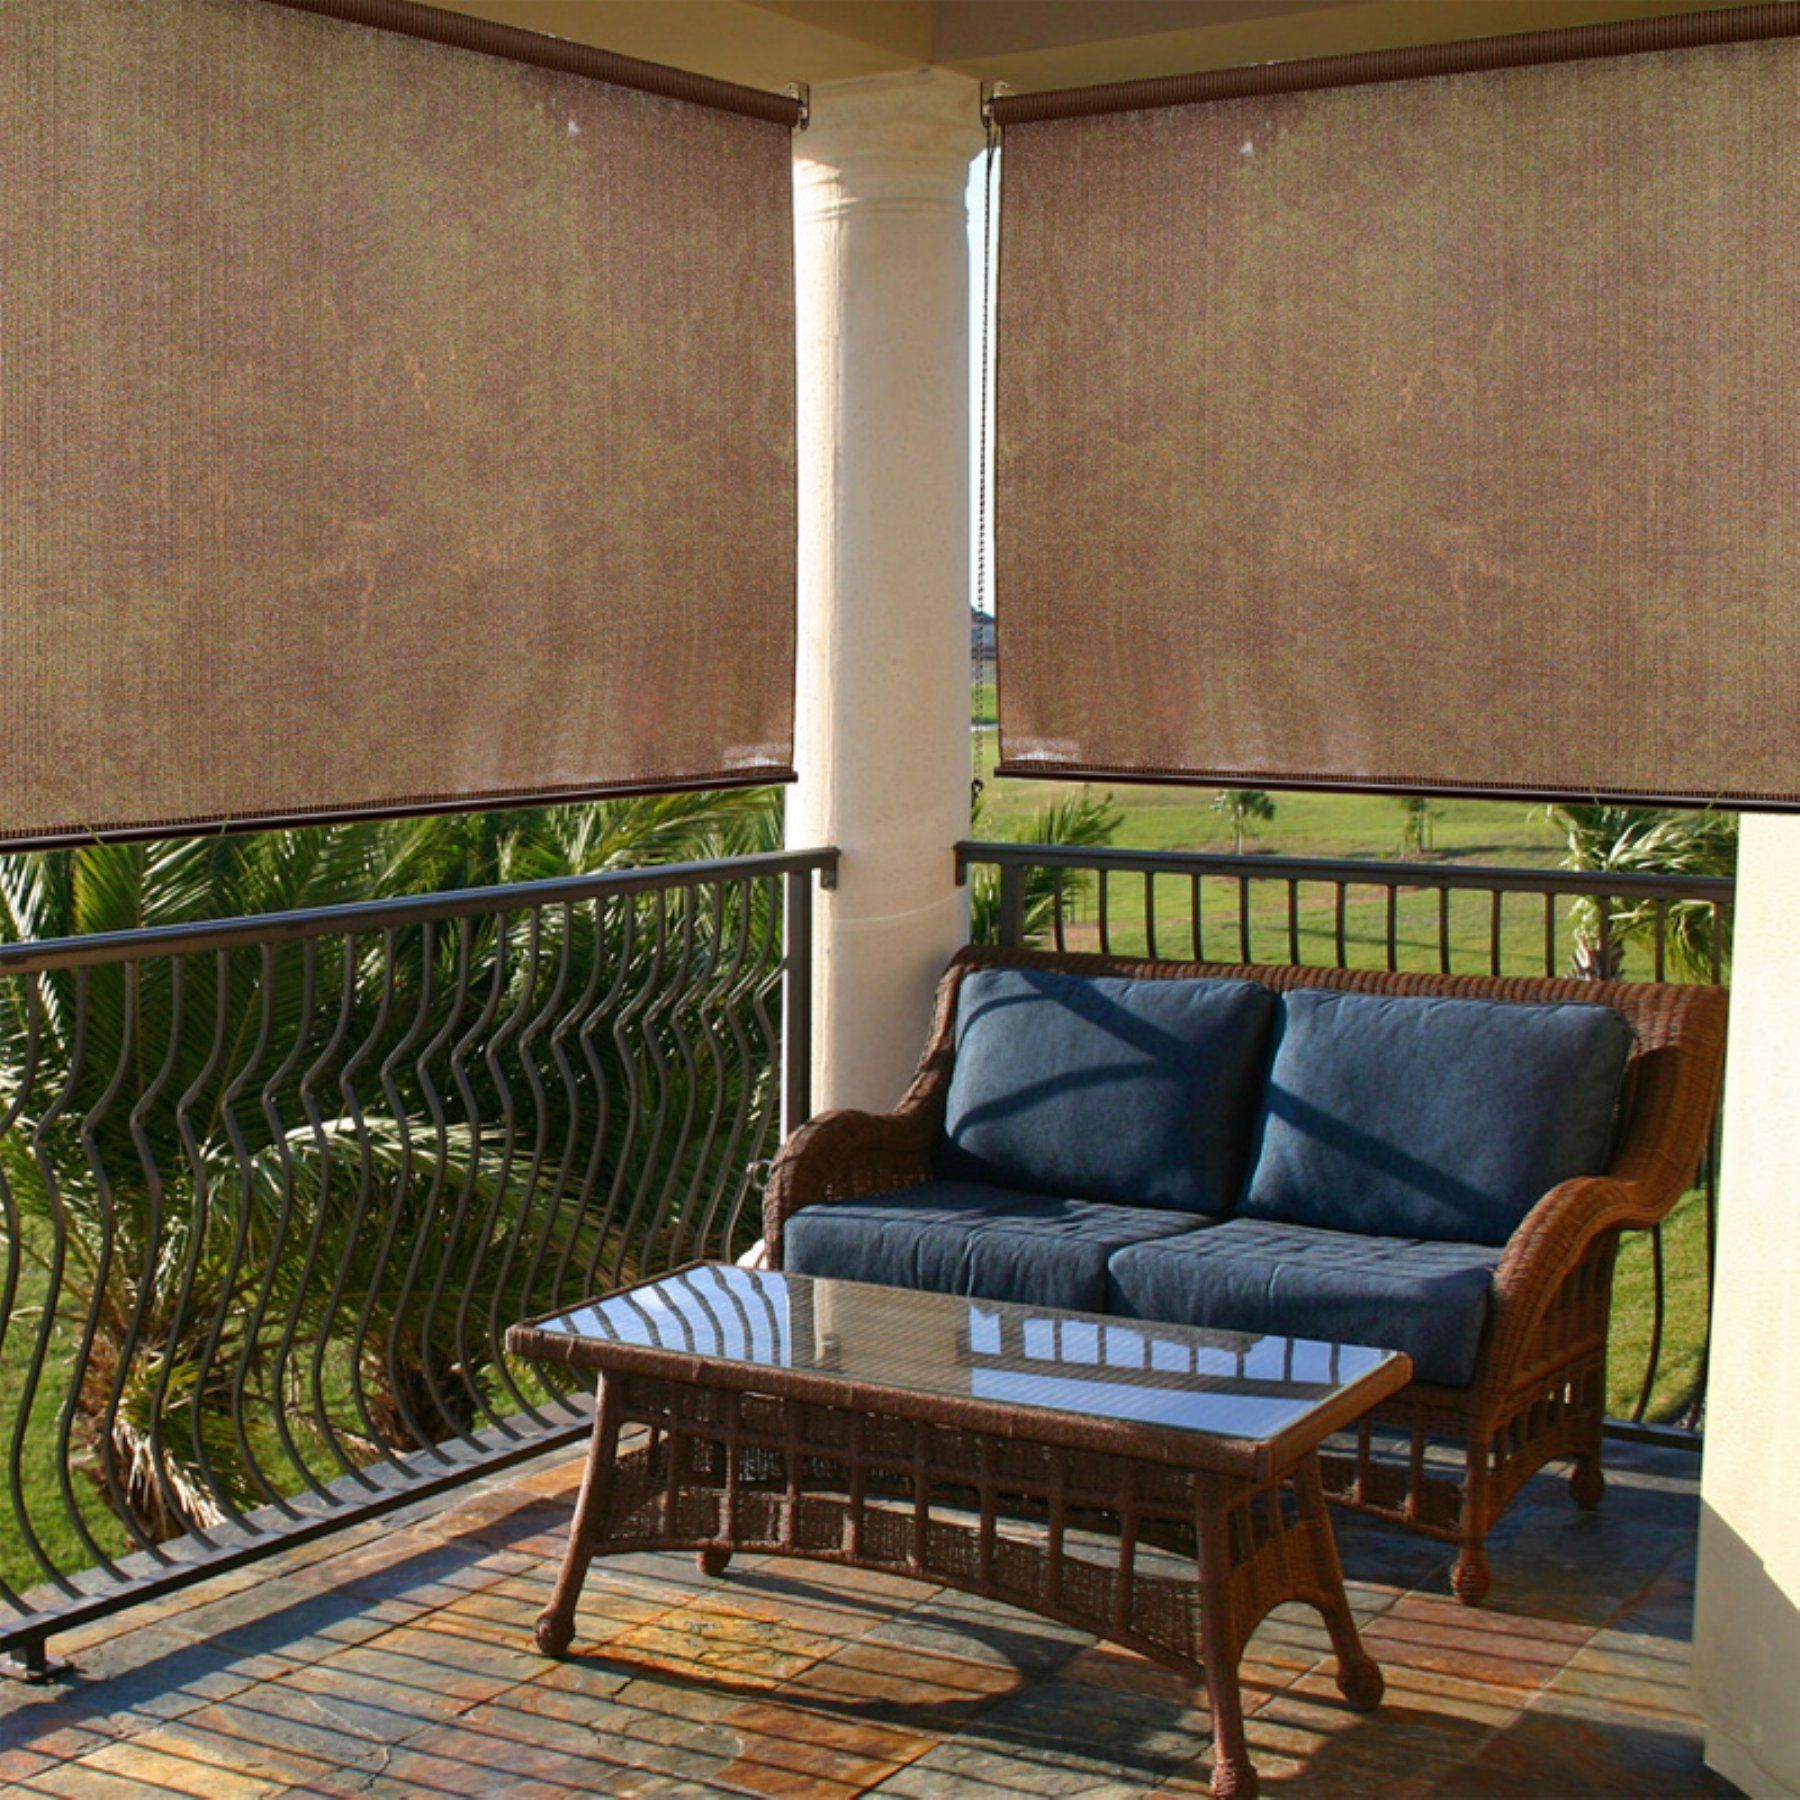 Radiance Cocoa Indoor Outdoor Roller Exterior Sun Shade 2310014 Outdoor Shade Porch Shades Exterior Solar Shade